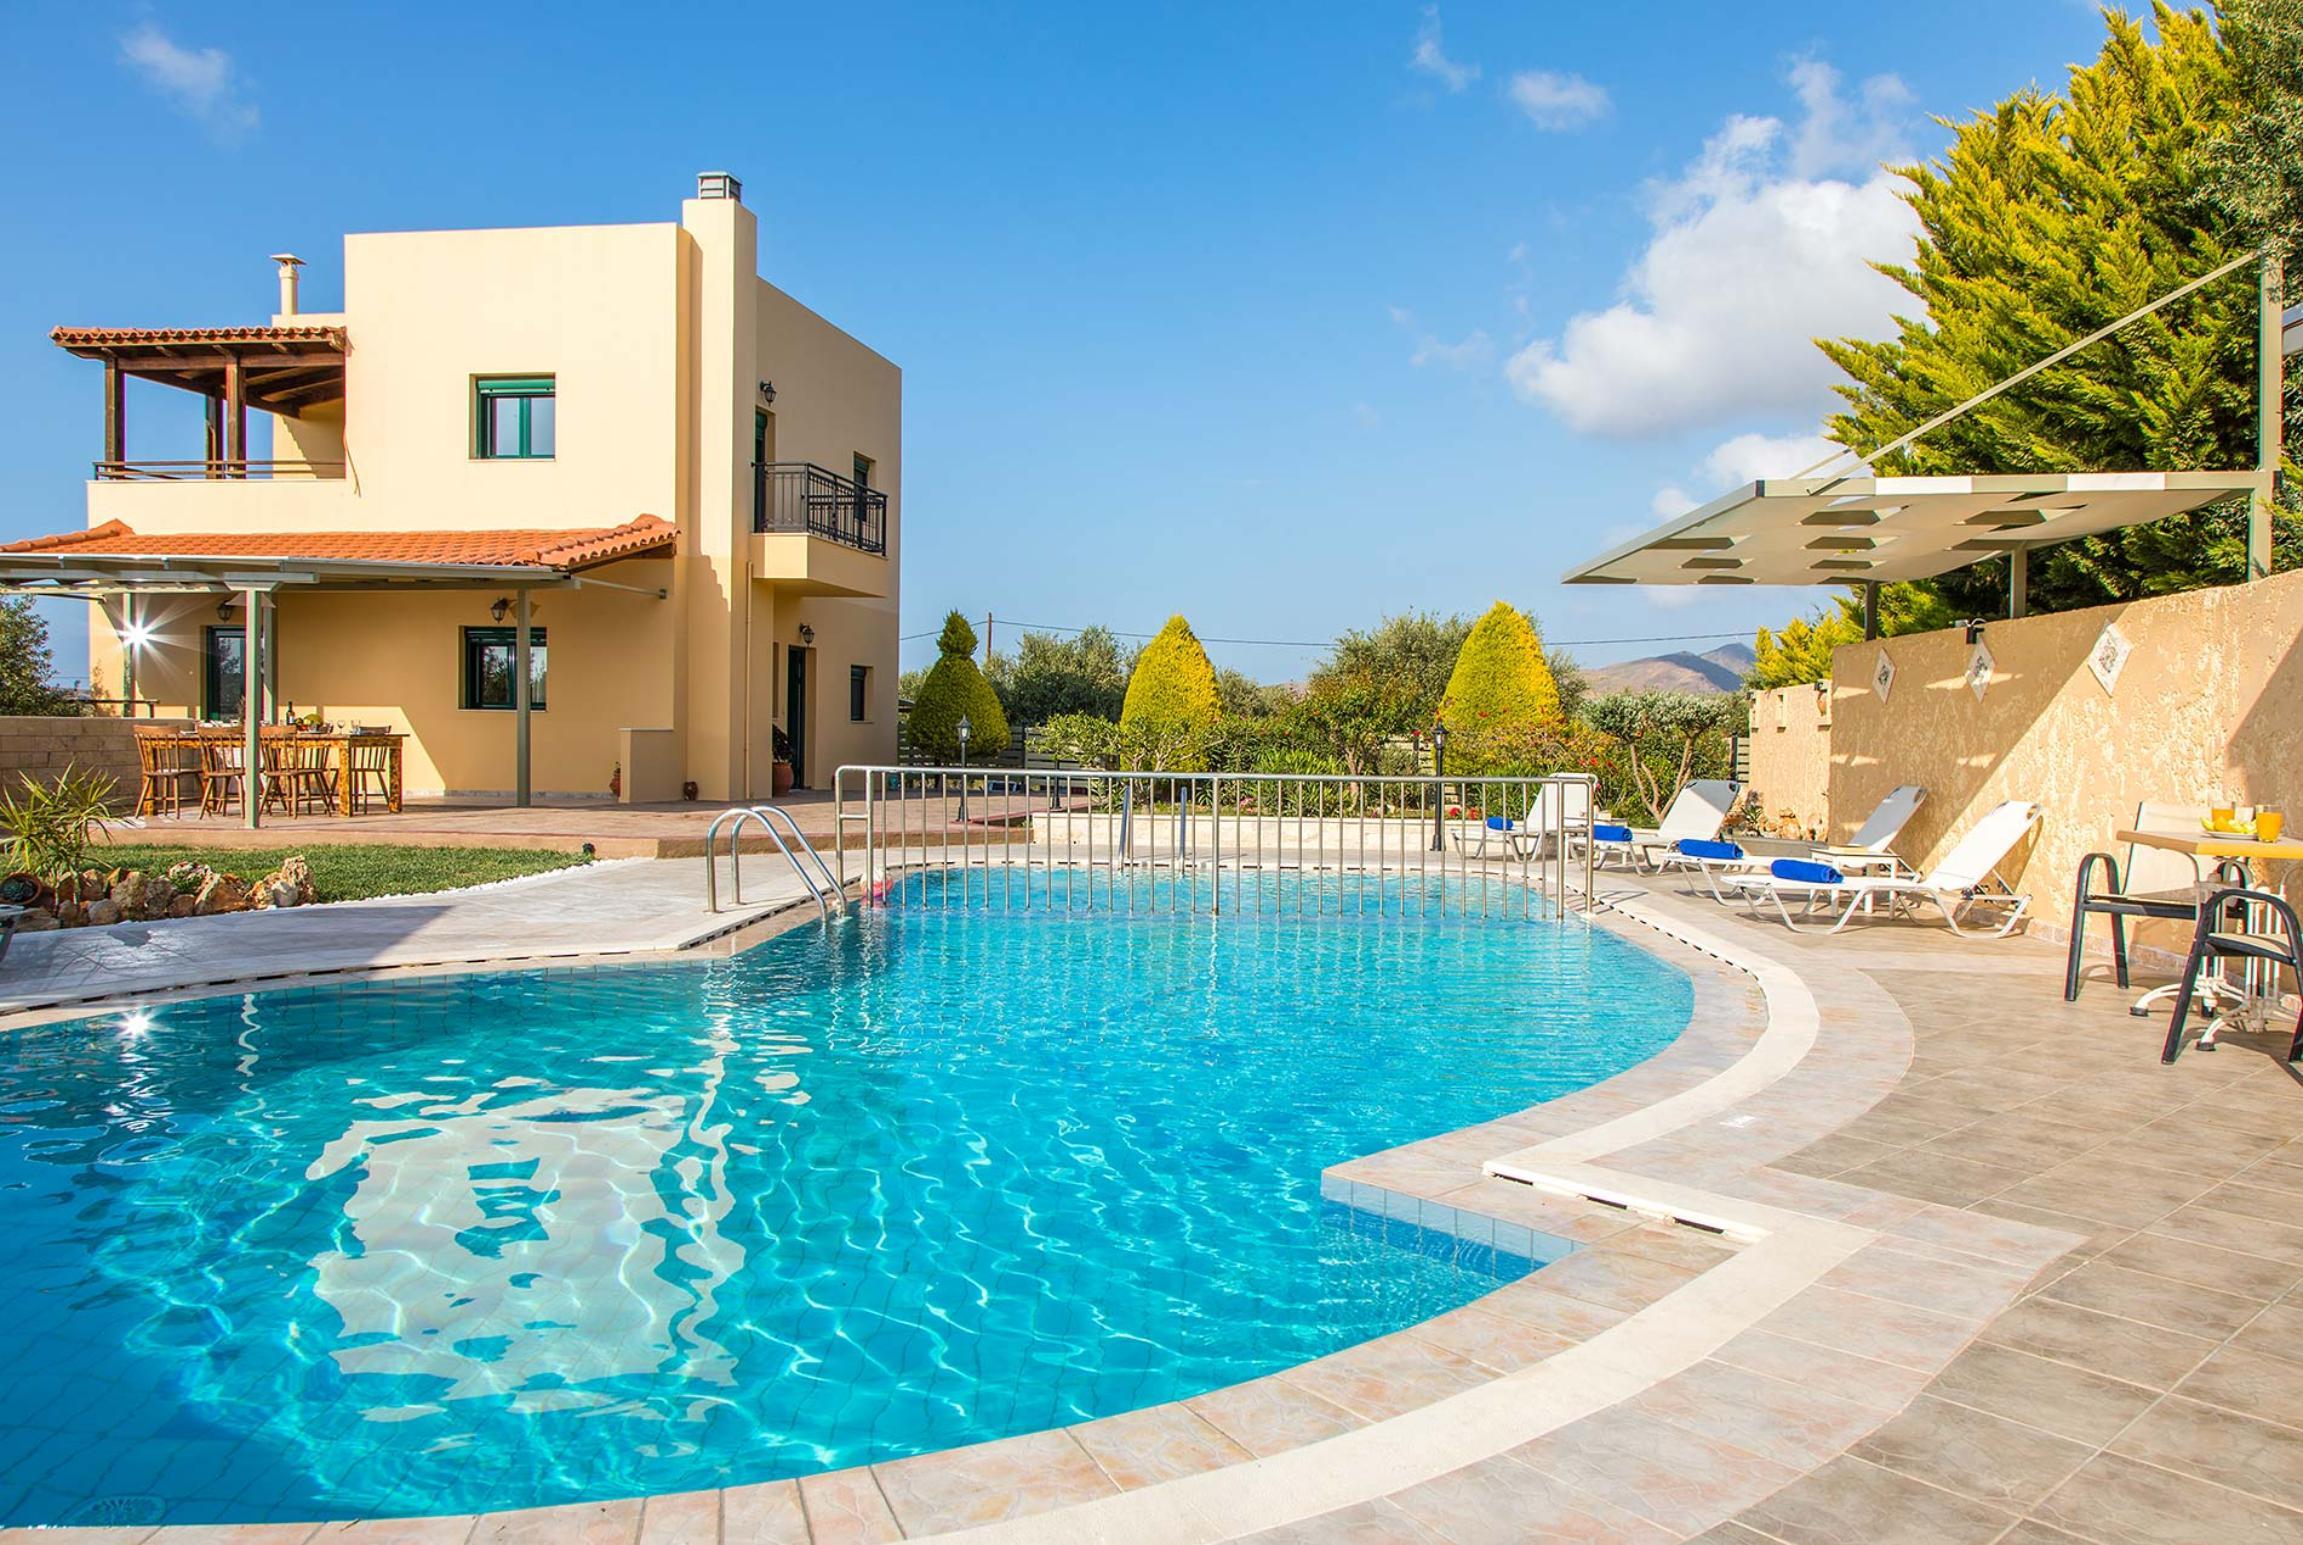 Ferienhaus Dina (2653758), Roumeli, Kreta Nordküste, Kreta, Griechenland, Bild 29